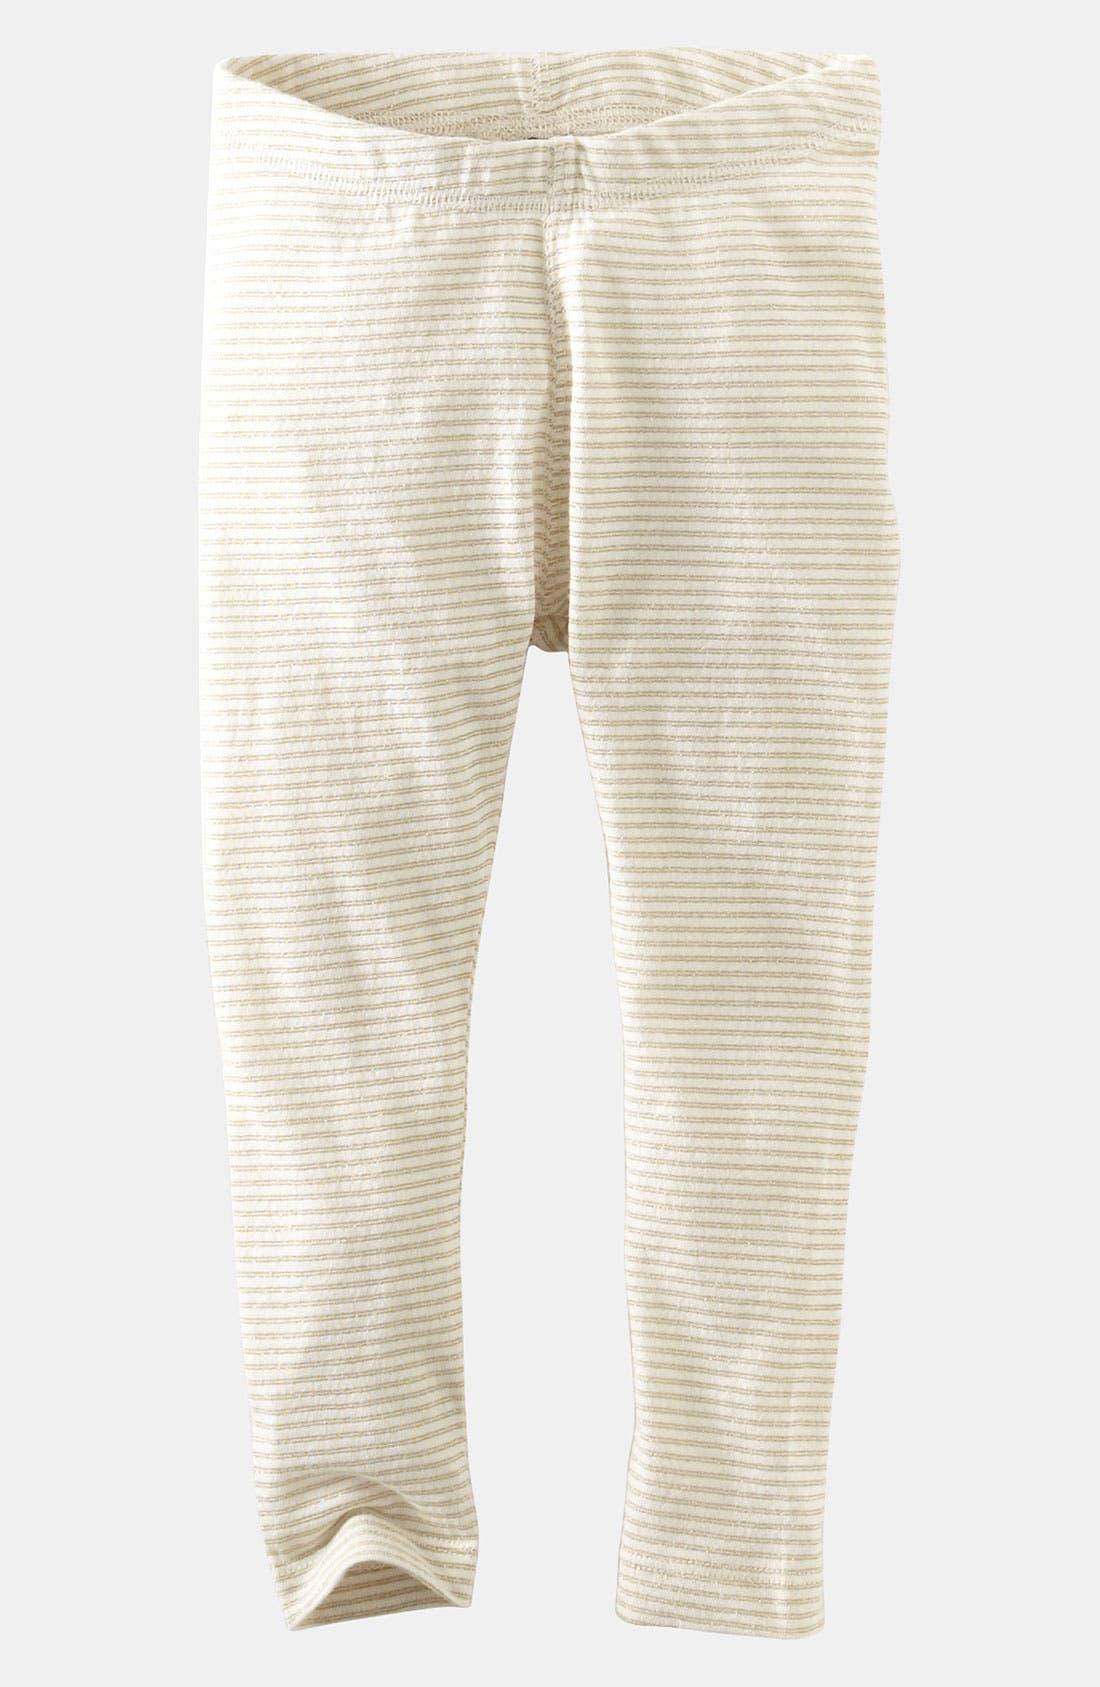 Alternate Image 1 Selected - Tea Collection Sparkle Stripe Leggings (Little Girls & Big Girls)